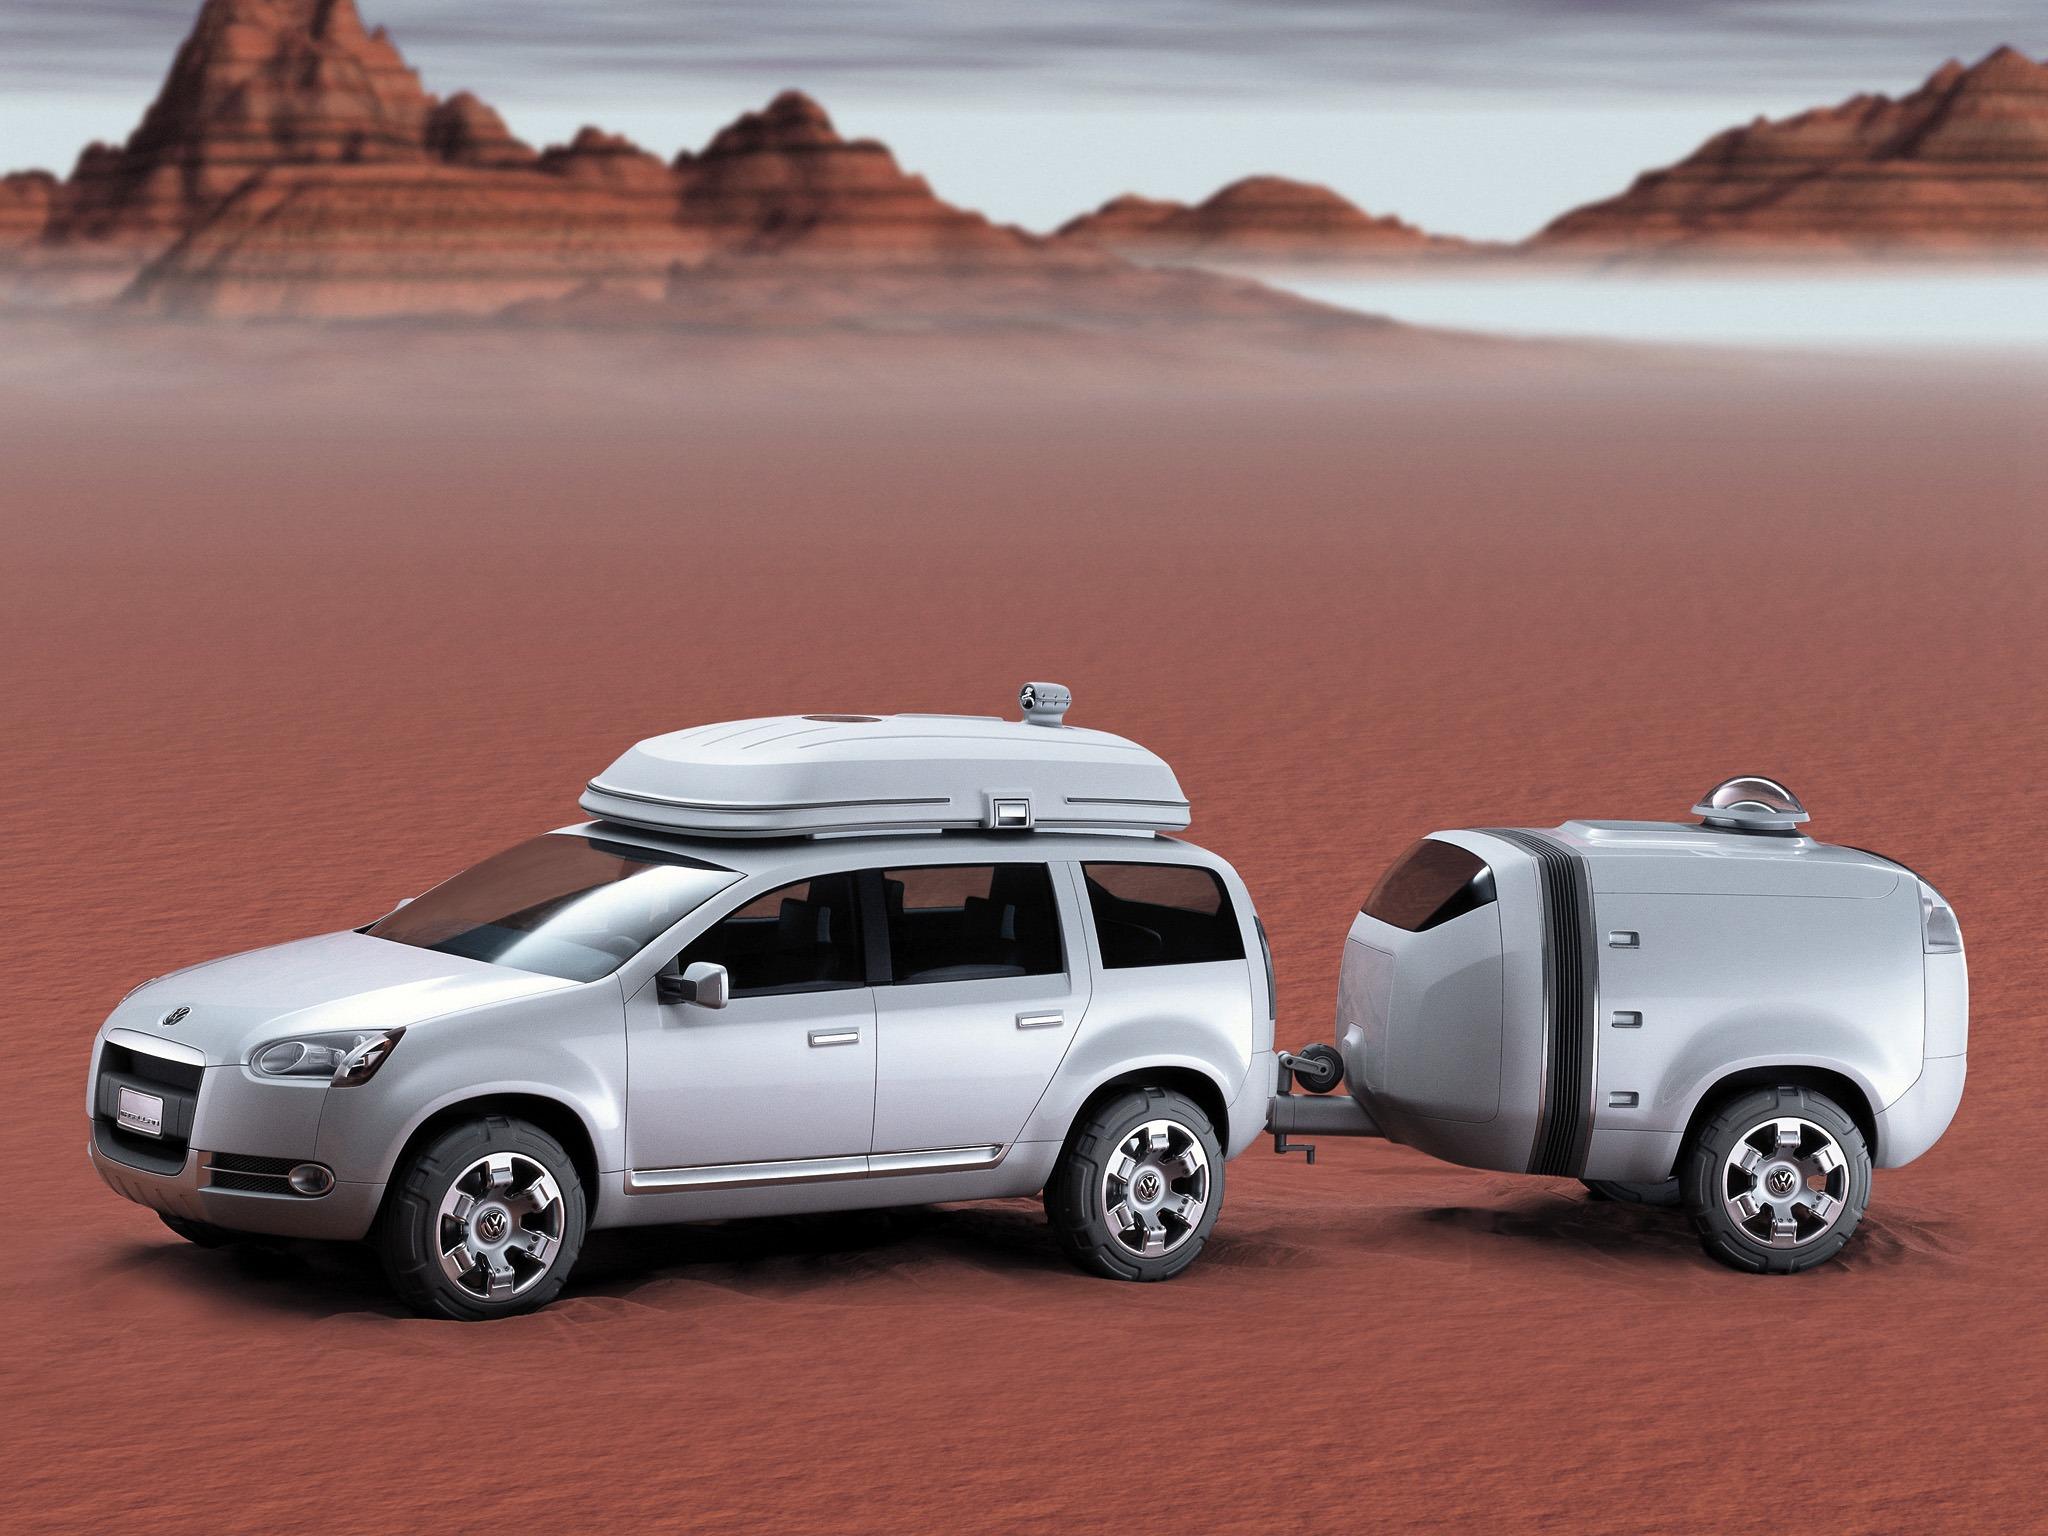 Auto Care Near Me >> Volkswagen Magellan Concept (2002) - Old Concept Cars